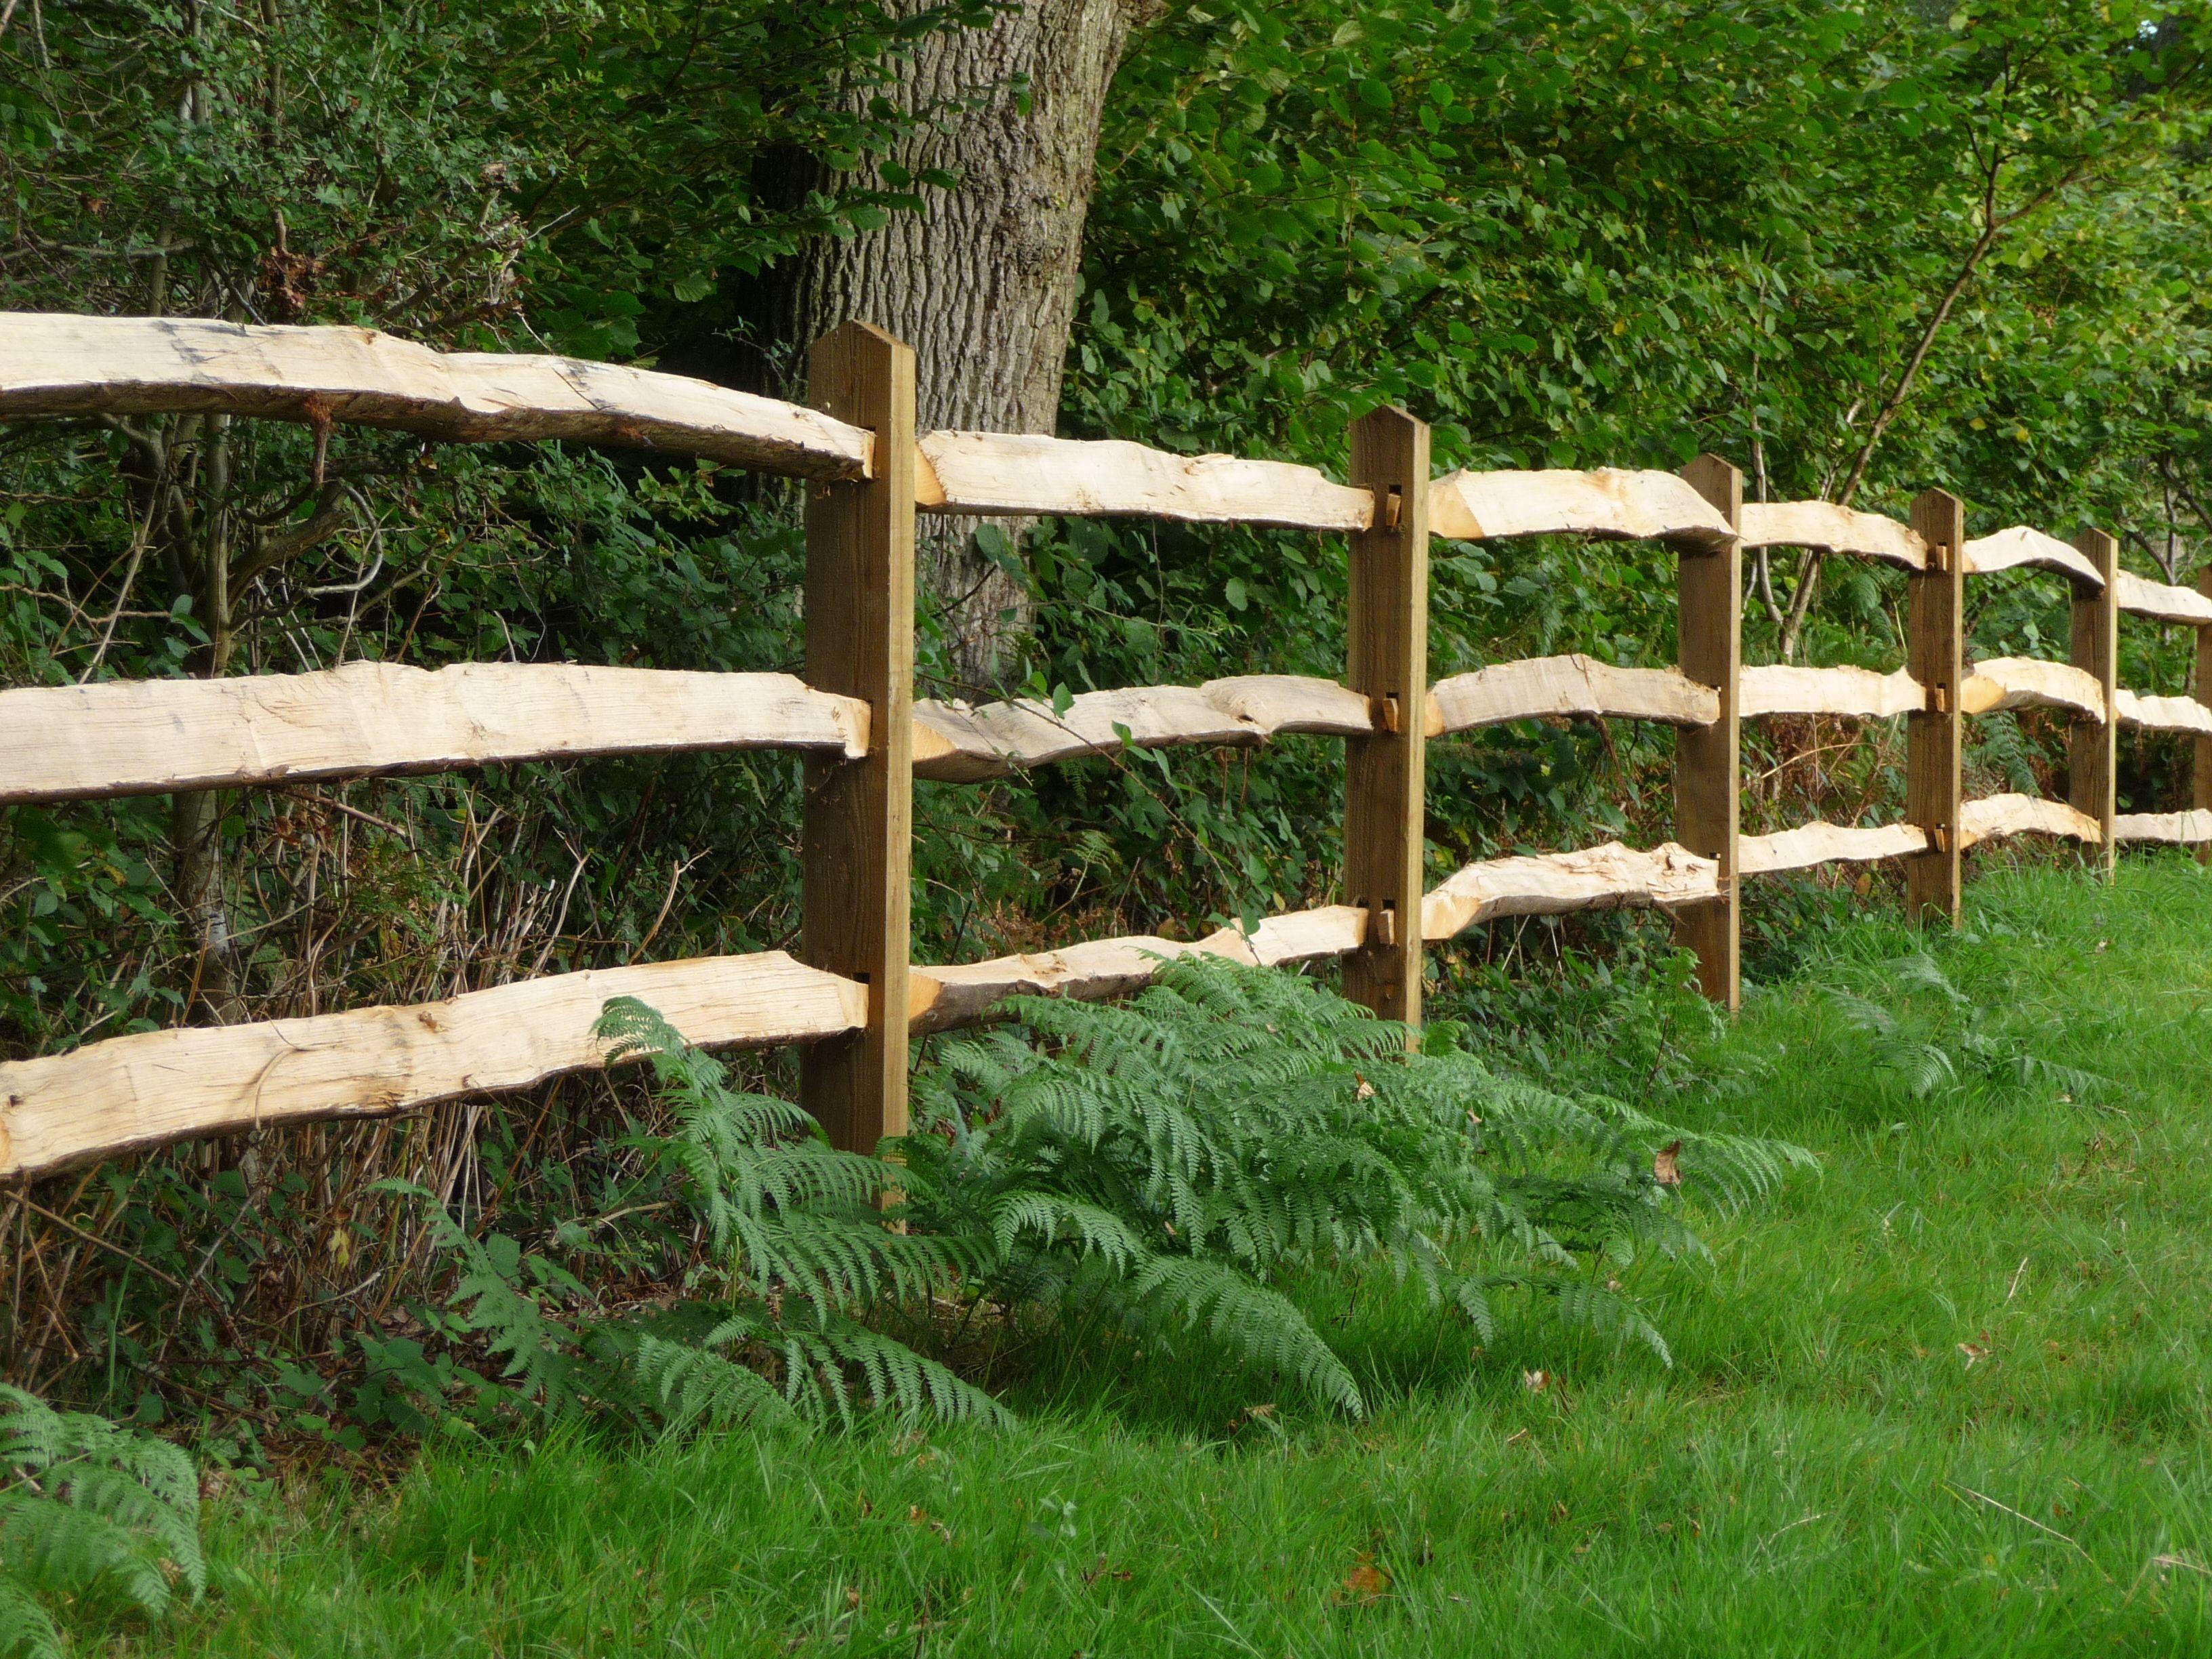 Post and rail fencing | Fences & Walls | Pinterest | Tops, Rail ...